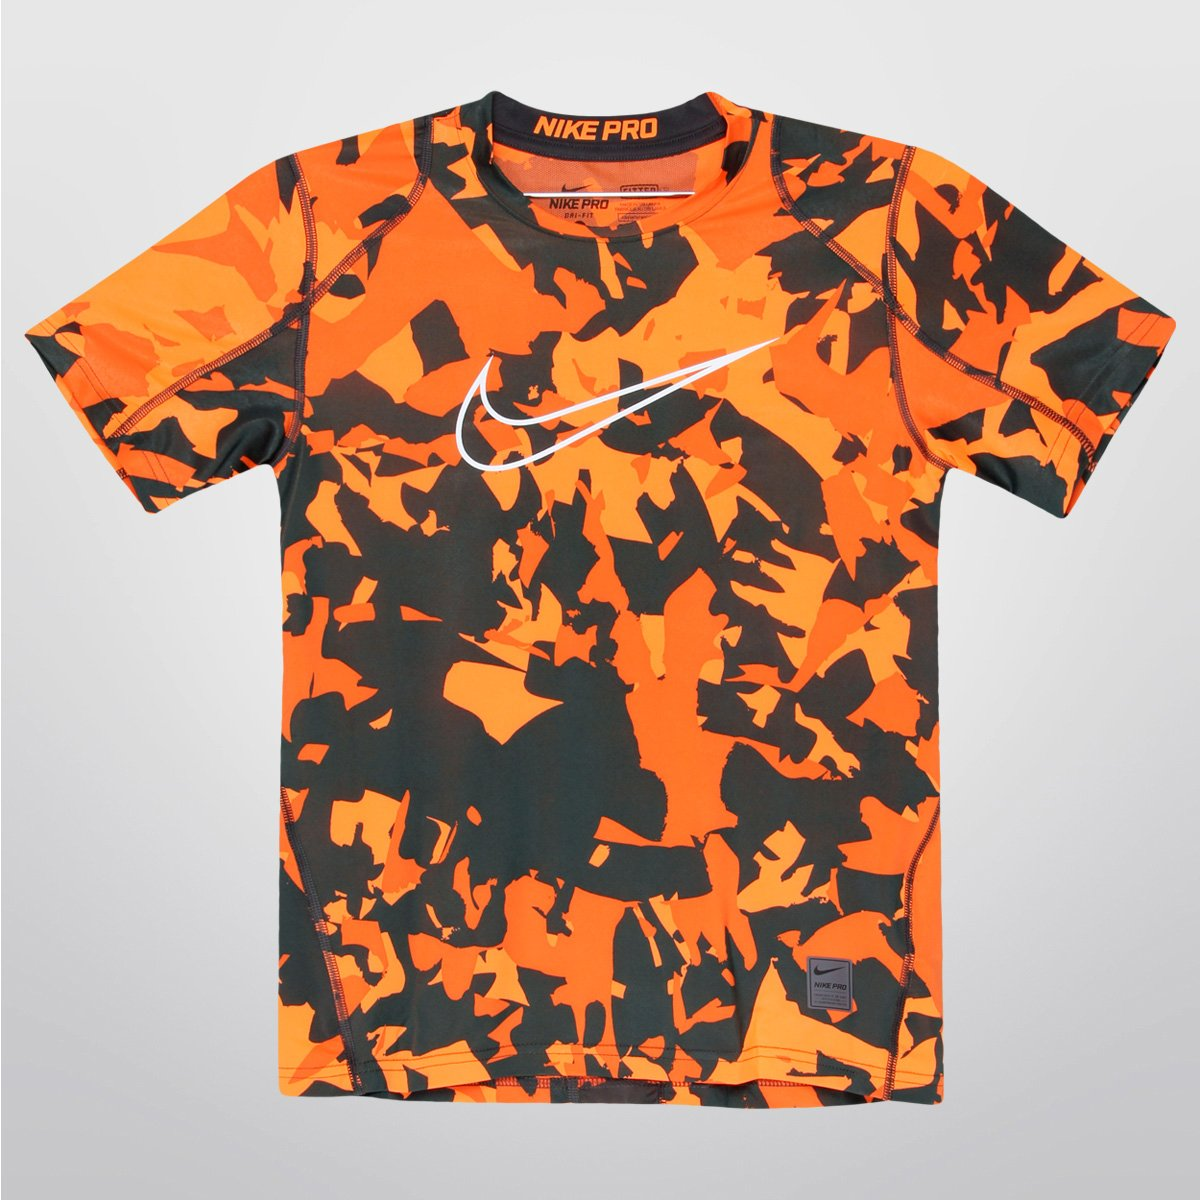 db7d580d6c04f Camiseta Nike Cool Aop Fitted Ss Infantil - Compre Agora